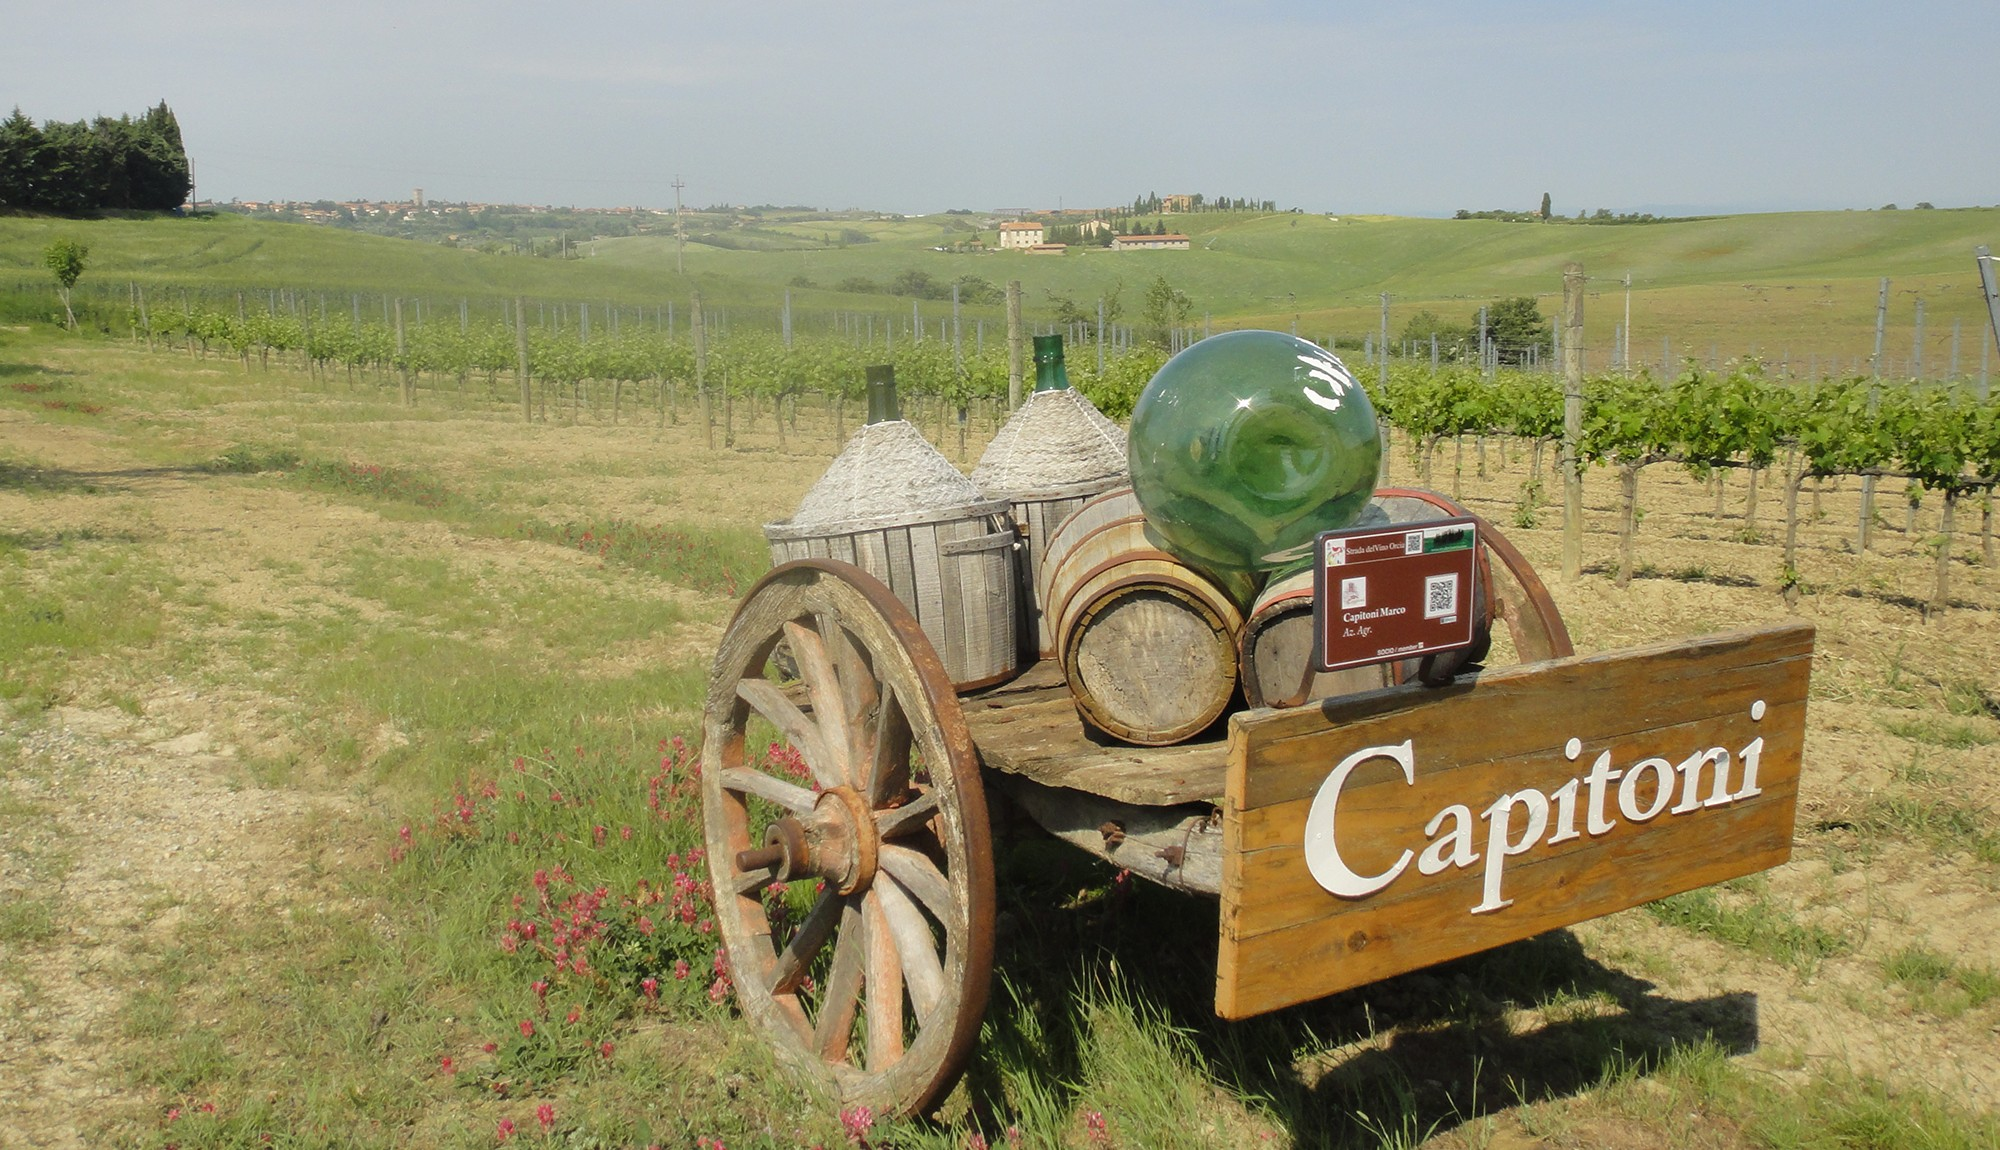 capitoni-1